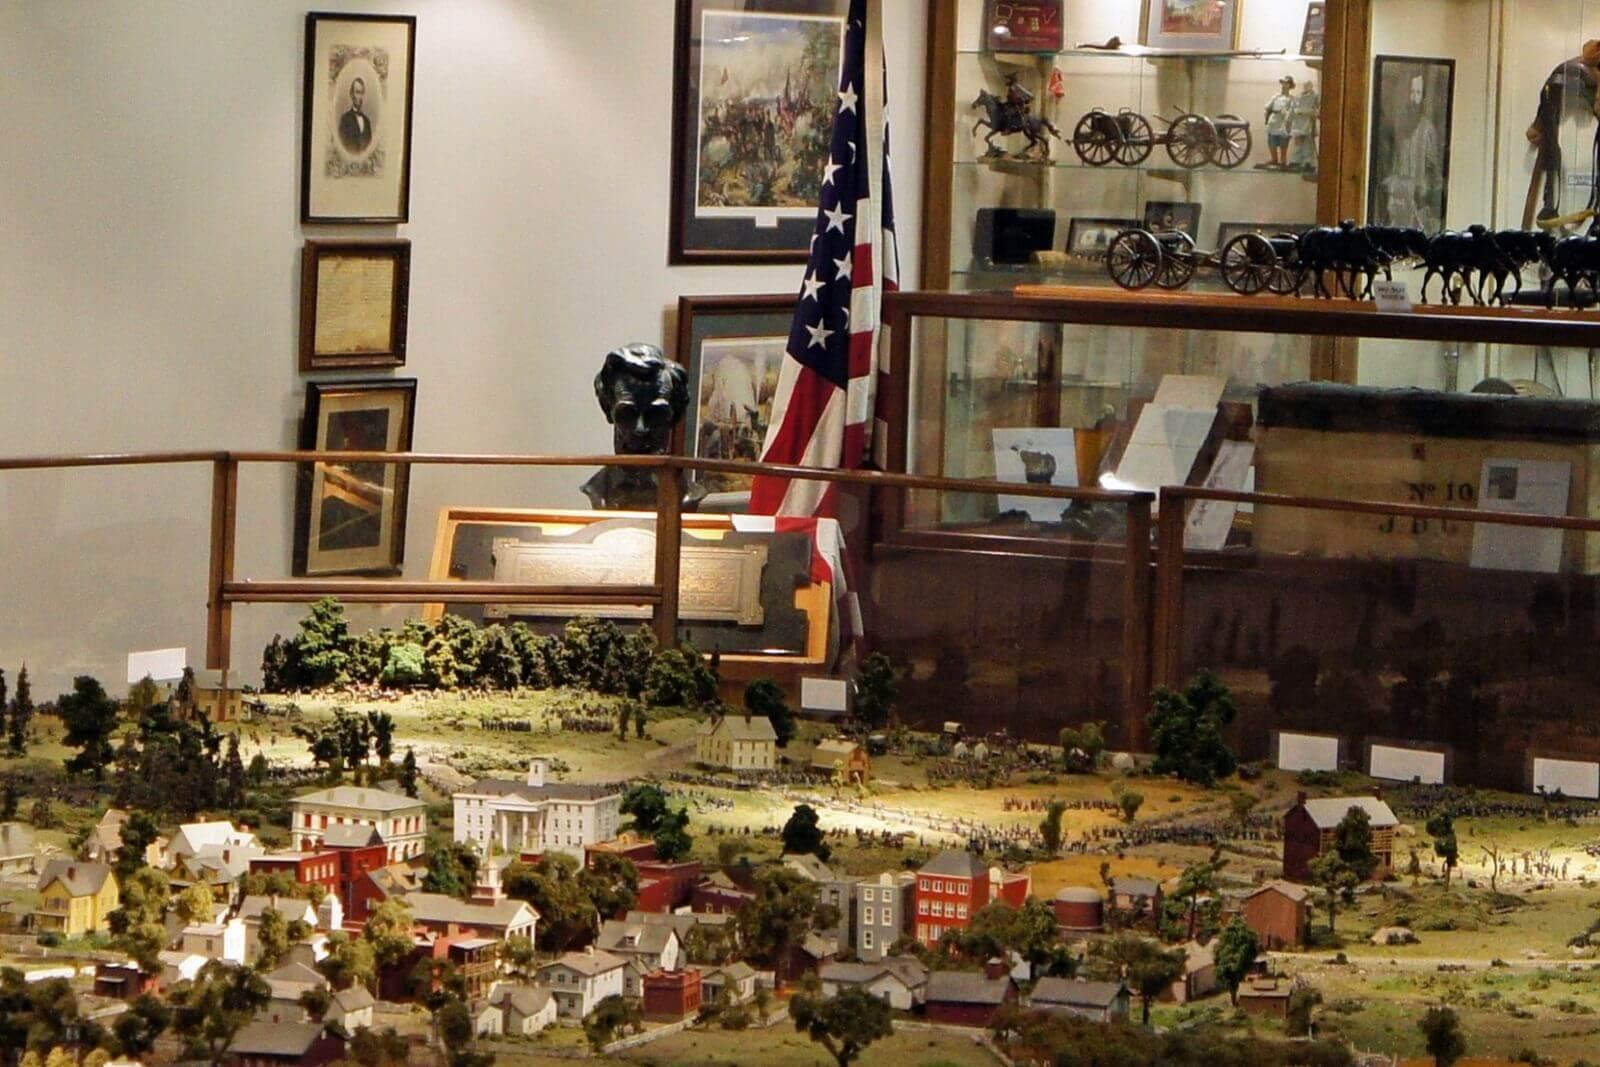 Gettysburg History Center Gettysburg Pa Things To Do